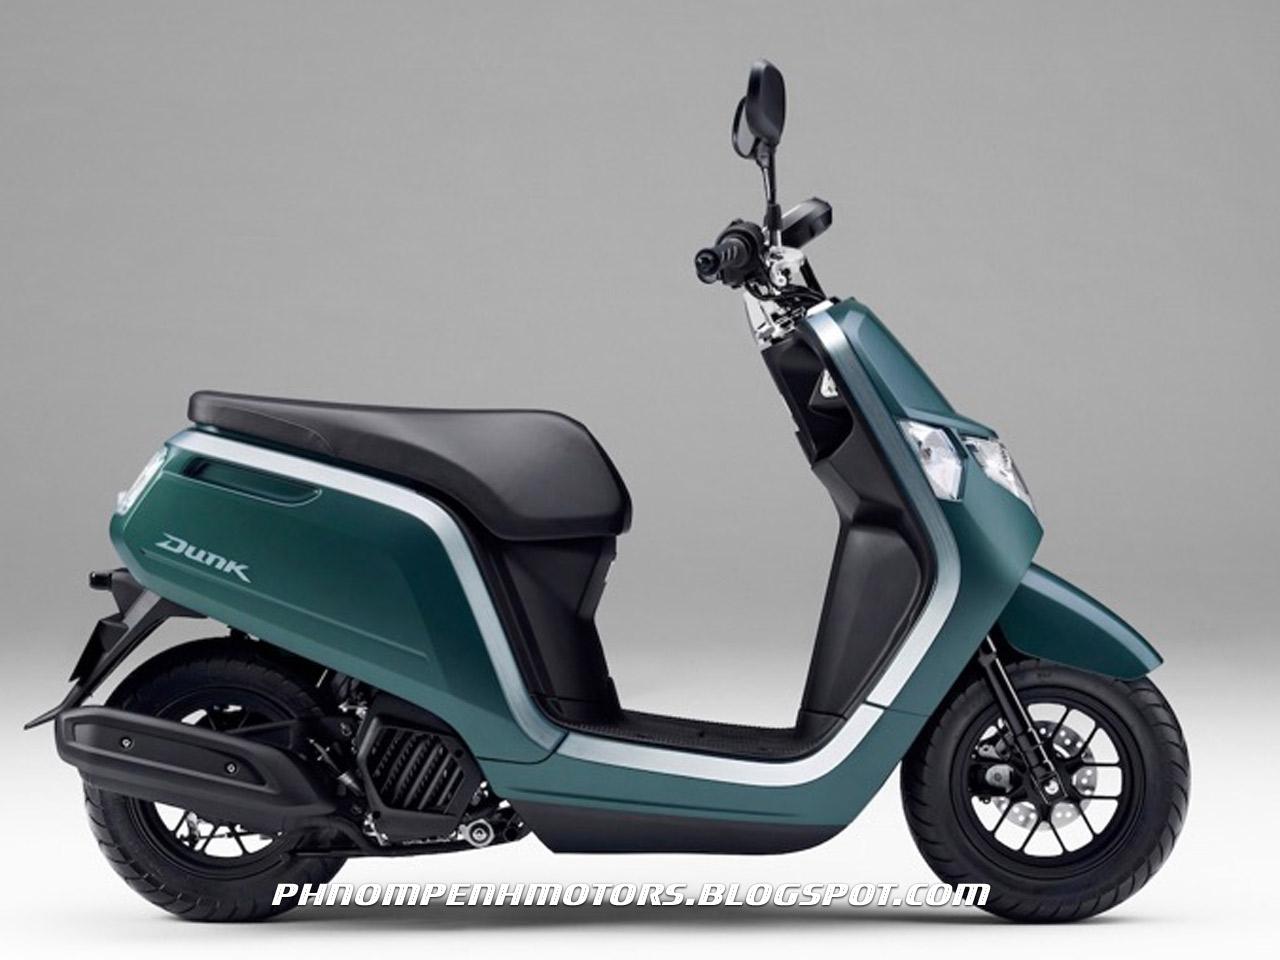 honda dunk 50cc coming soon price 1850 phnom penh motors. Black Bedroom Furniture Sets. Home Design Ideas